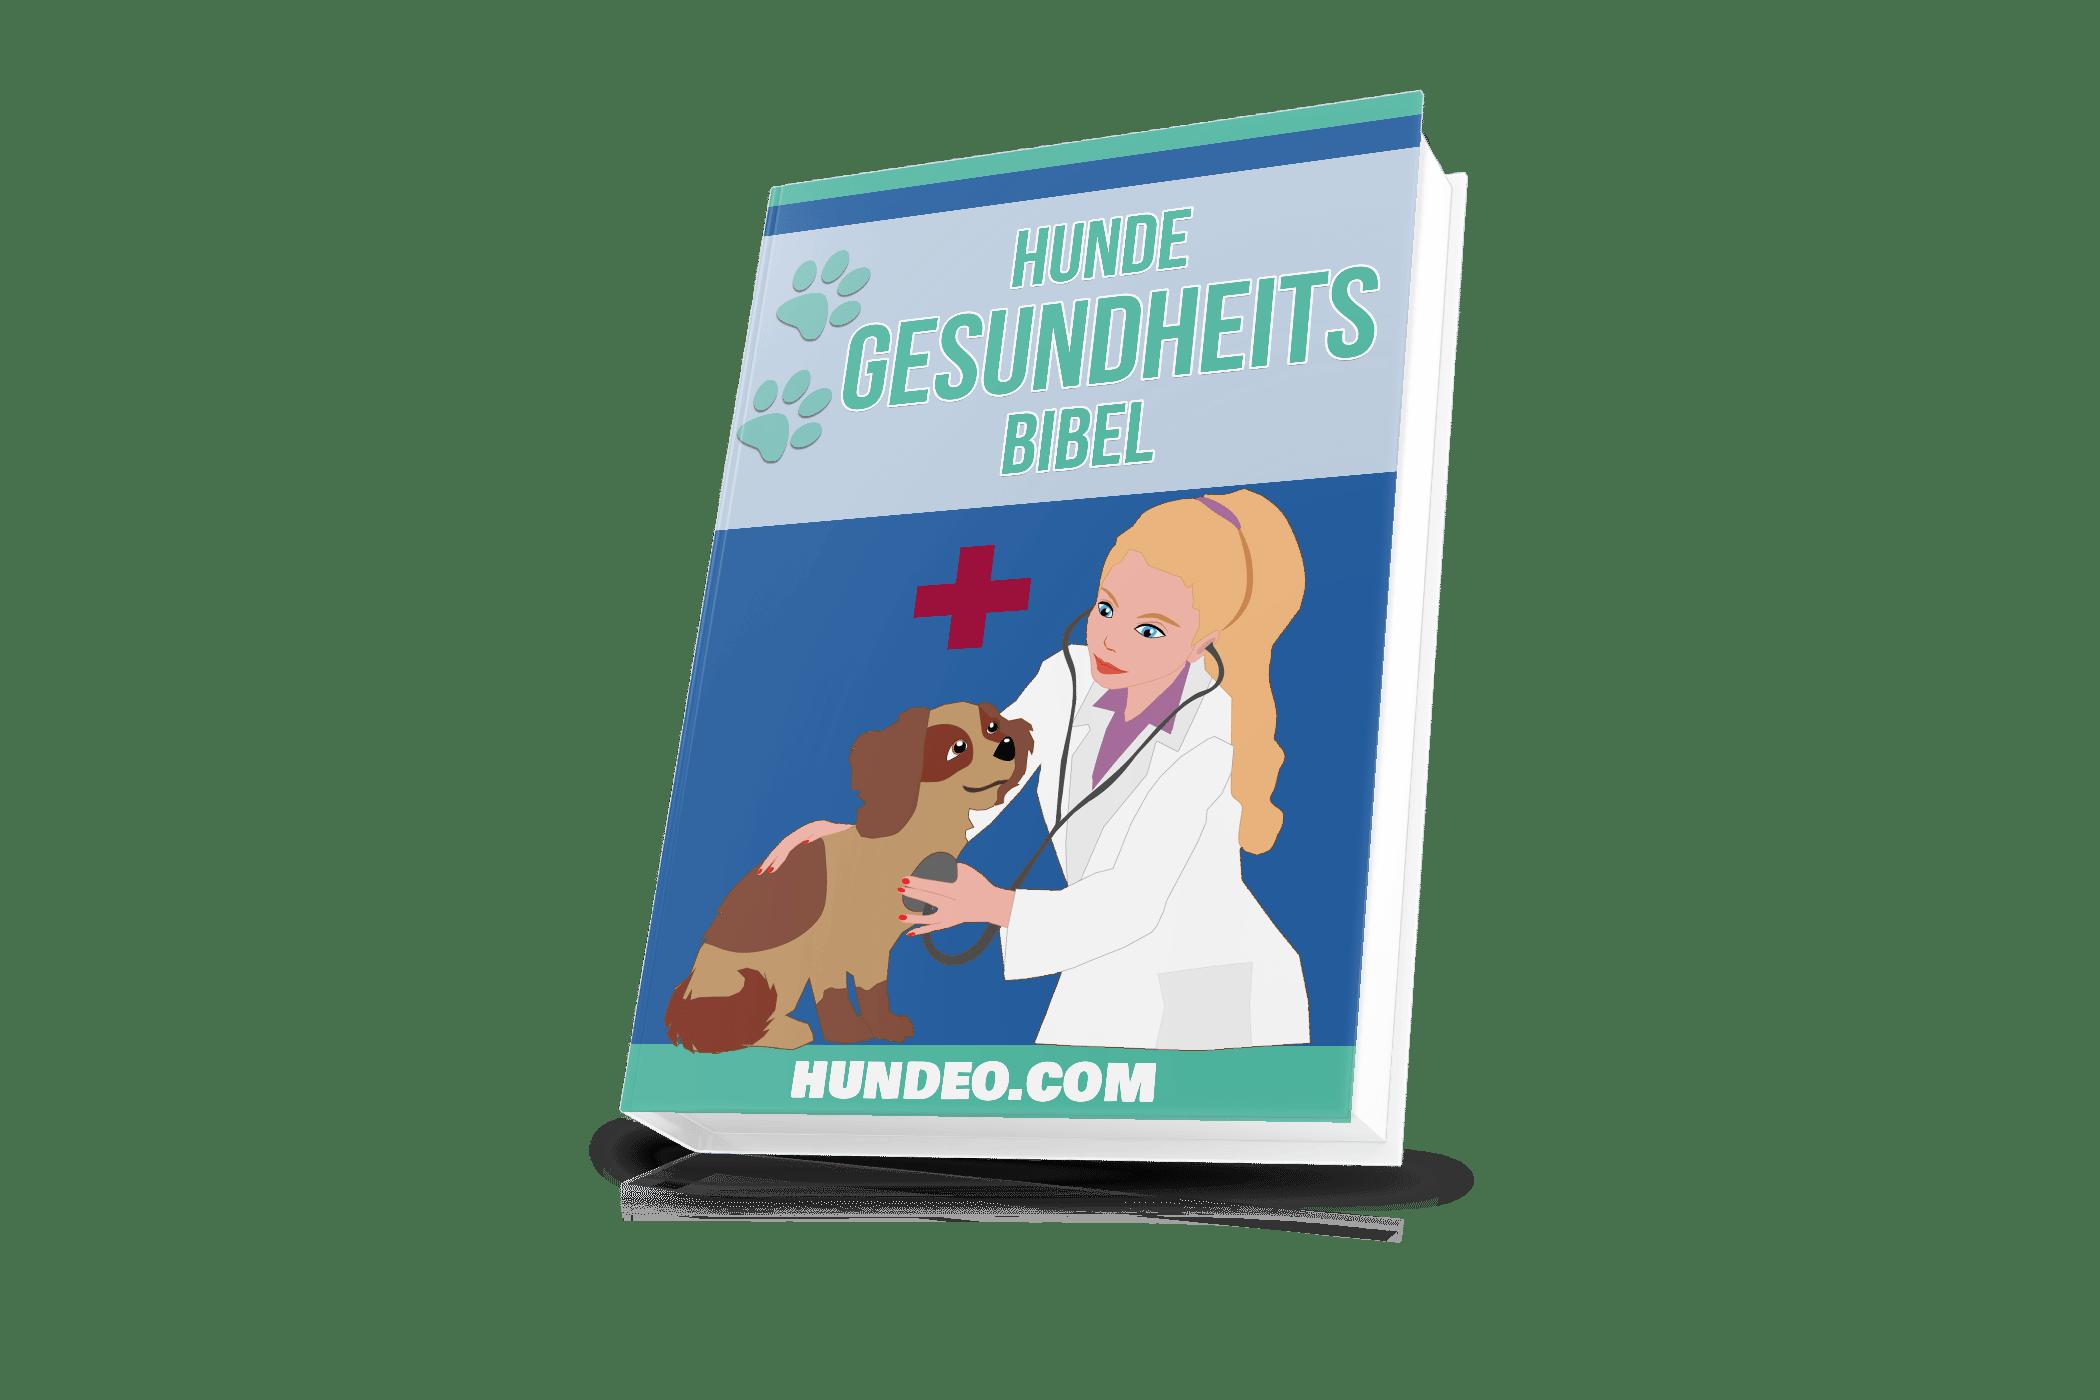 hunde gesundheits bibel 61 1